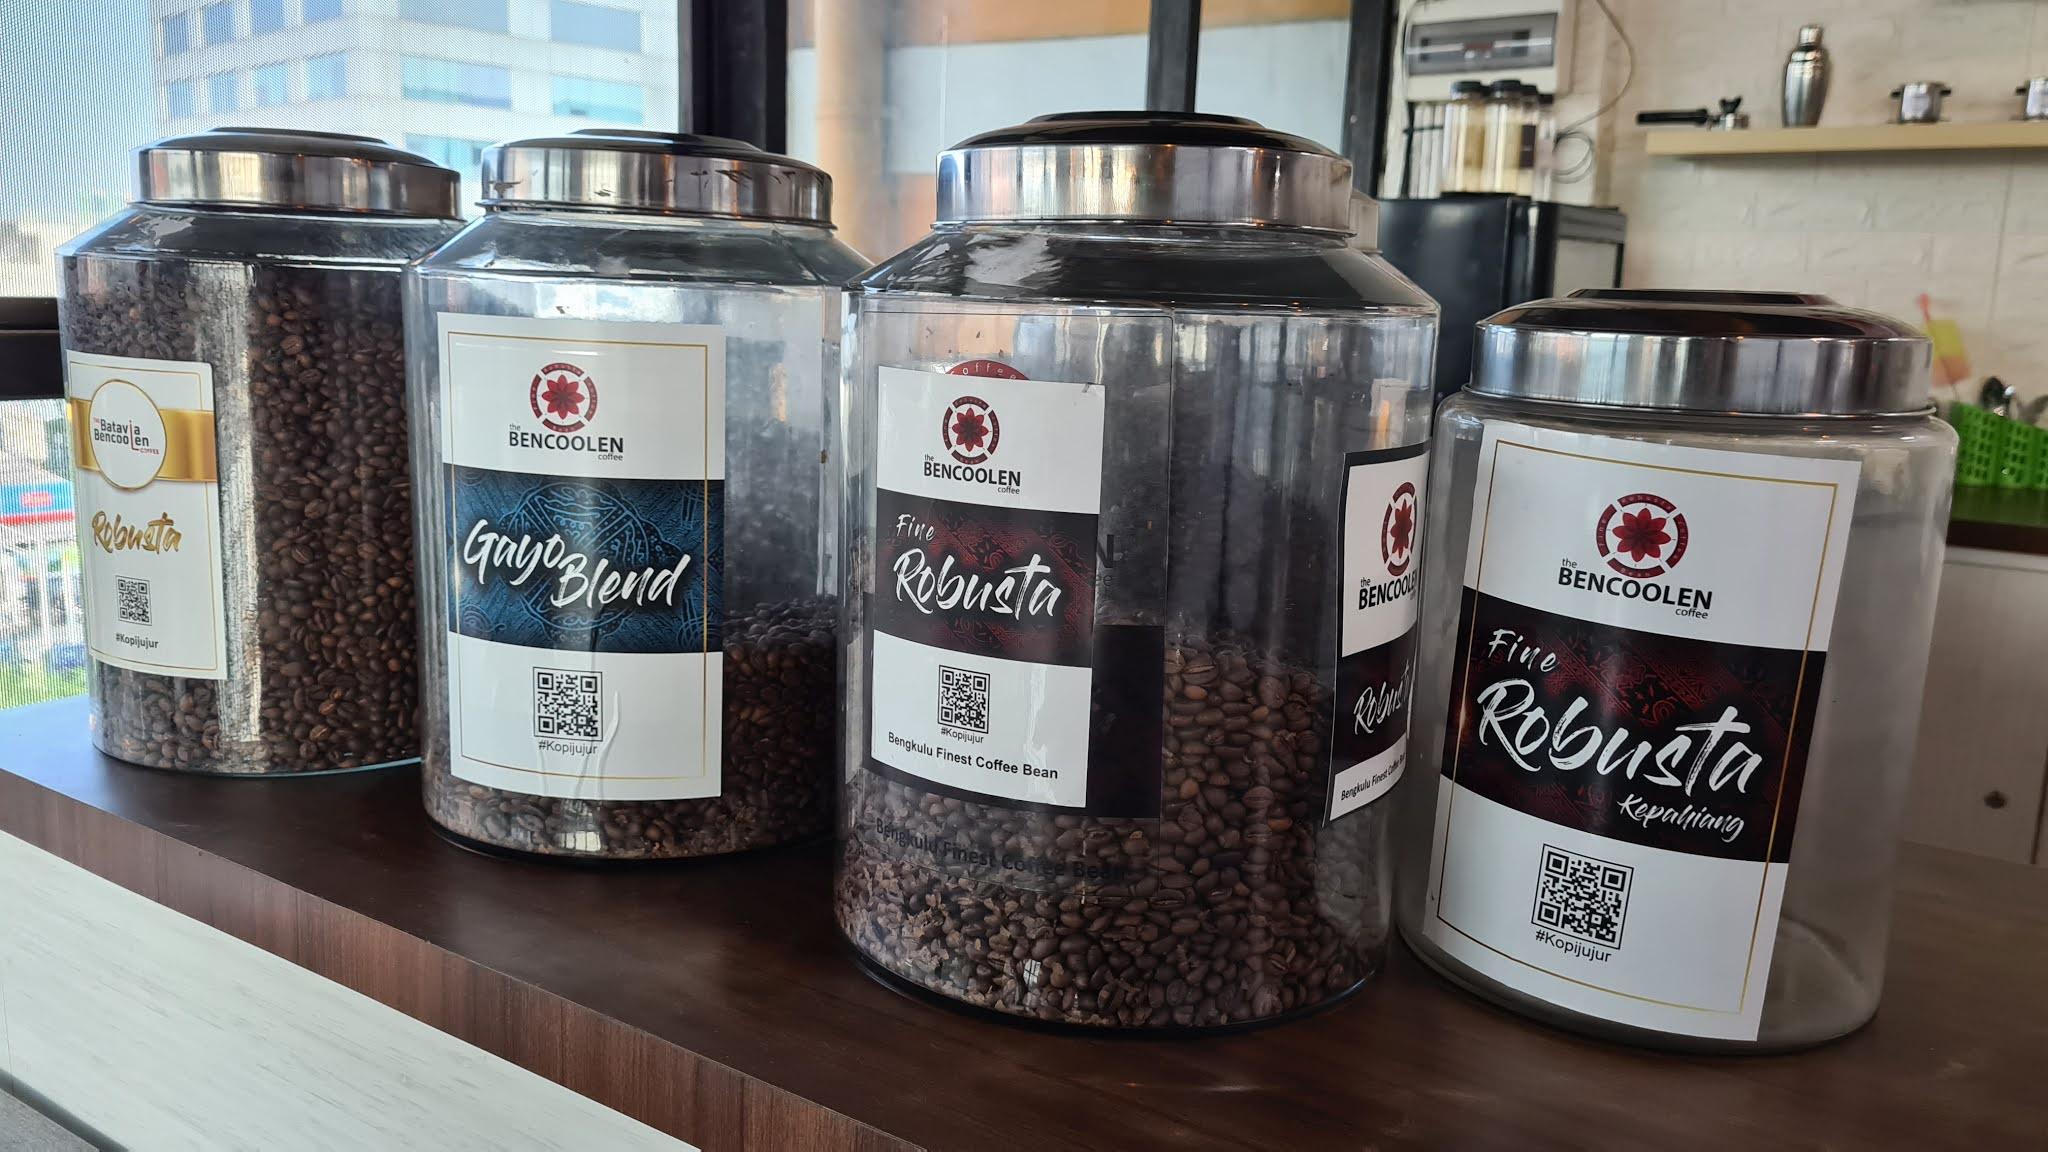 REVIEW COFFEE SHOP DI JAKARTA PUSAT: BENCOOLEN COFFEE